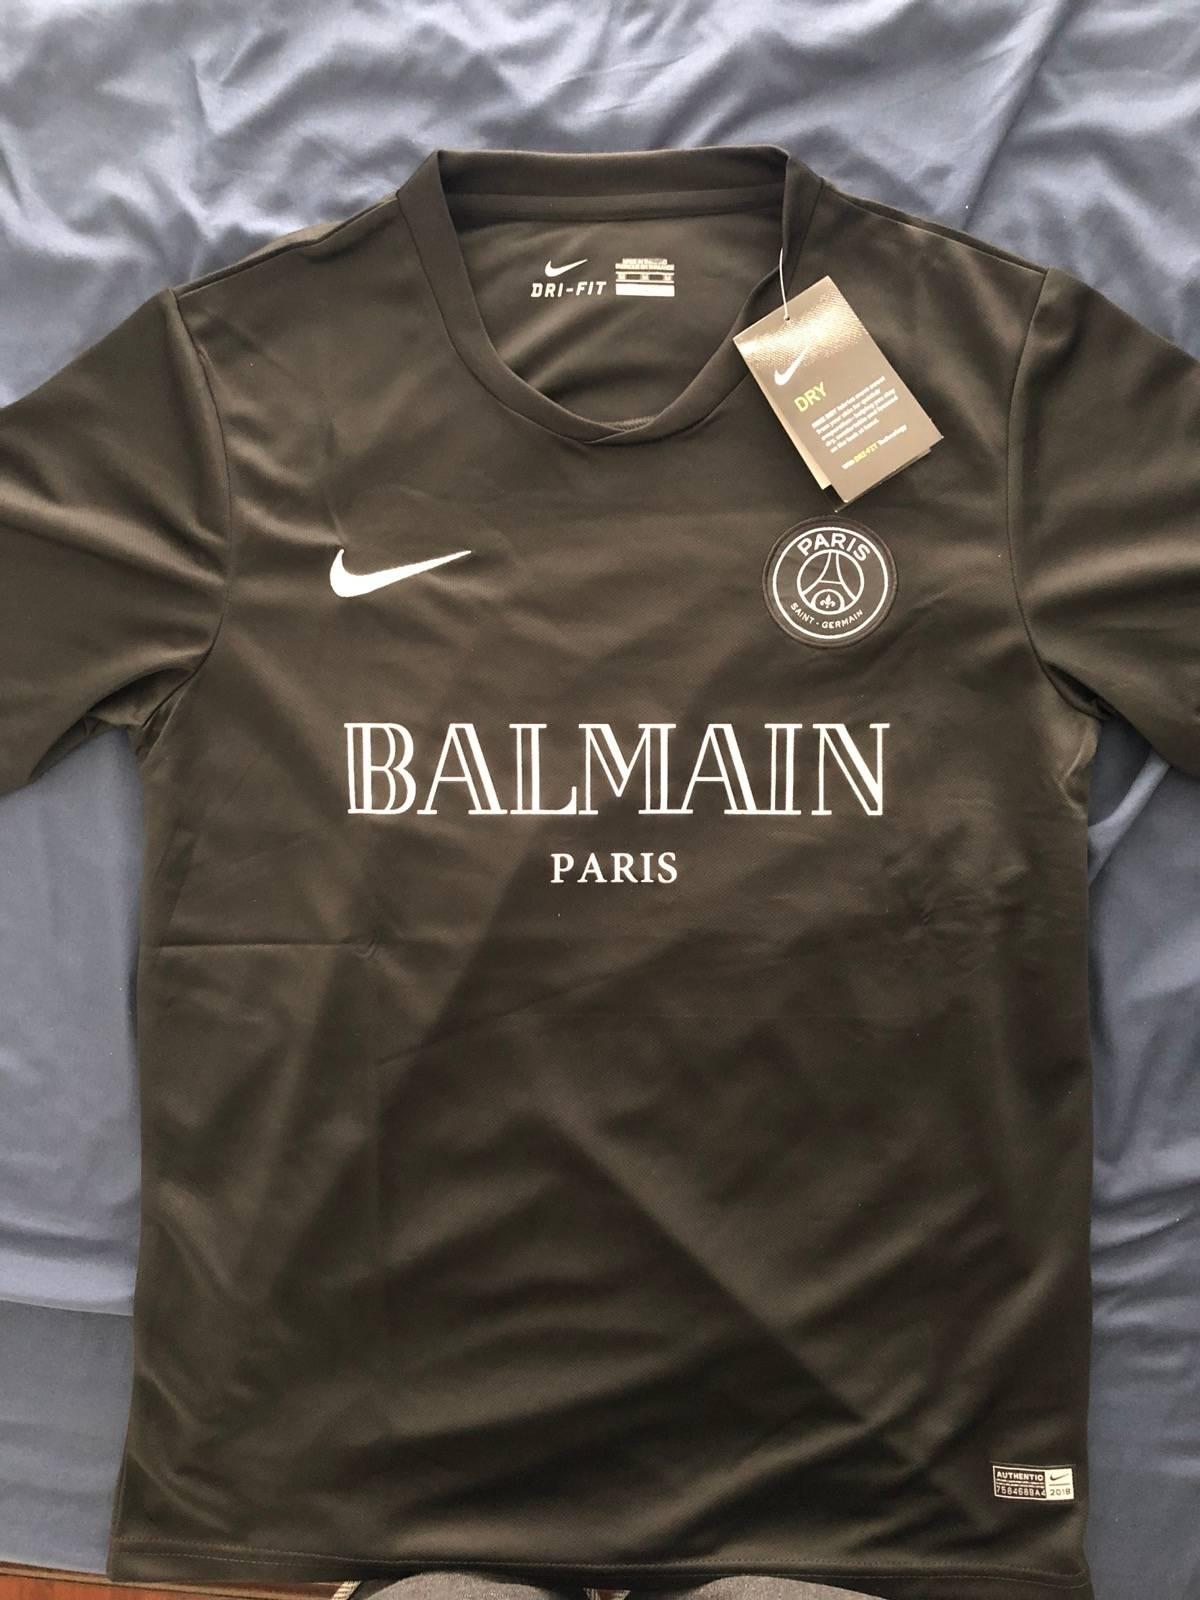 4b76681d9 Balmain Nike x Balmain x PSG Custom Medium Soccer Jersey Size m - Short  Sleeve T-Shirts for Sale - Grailed